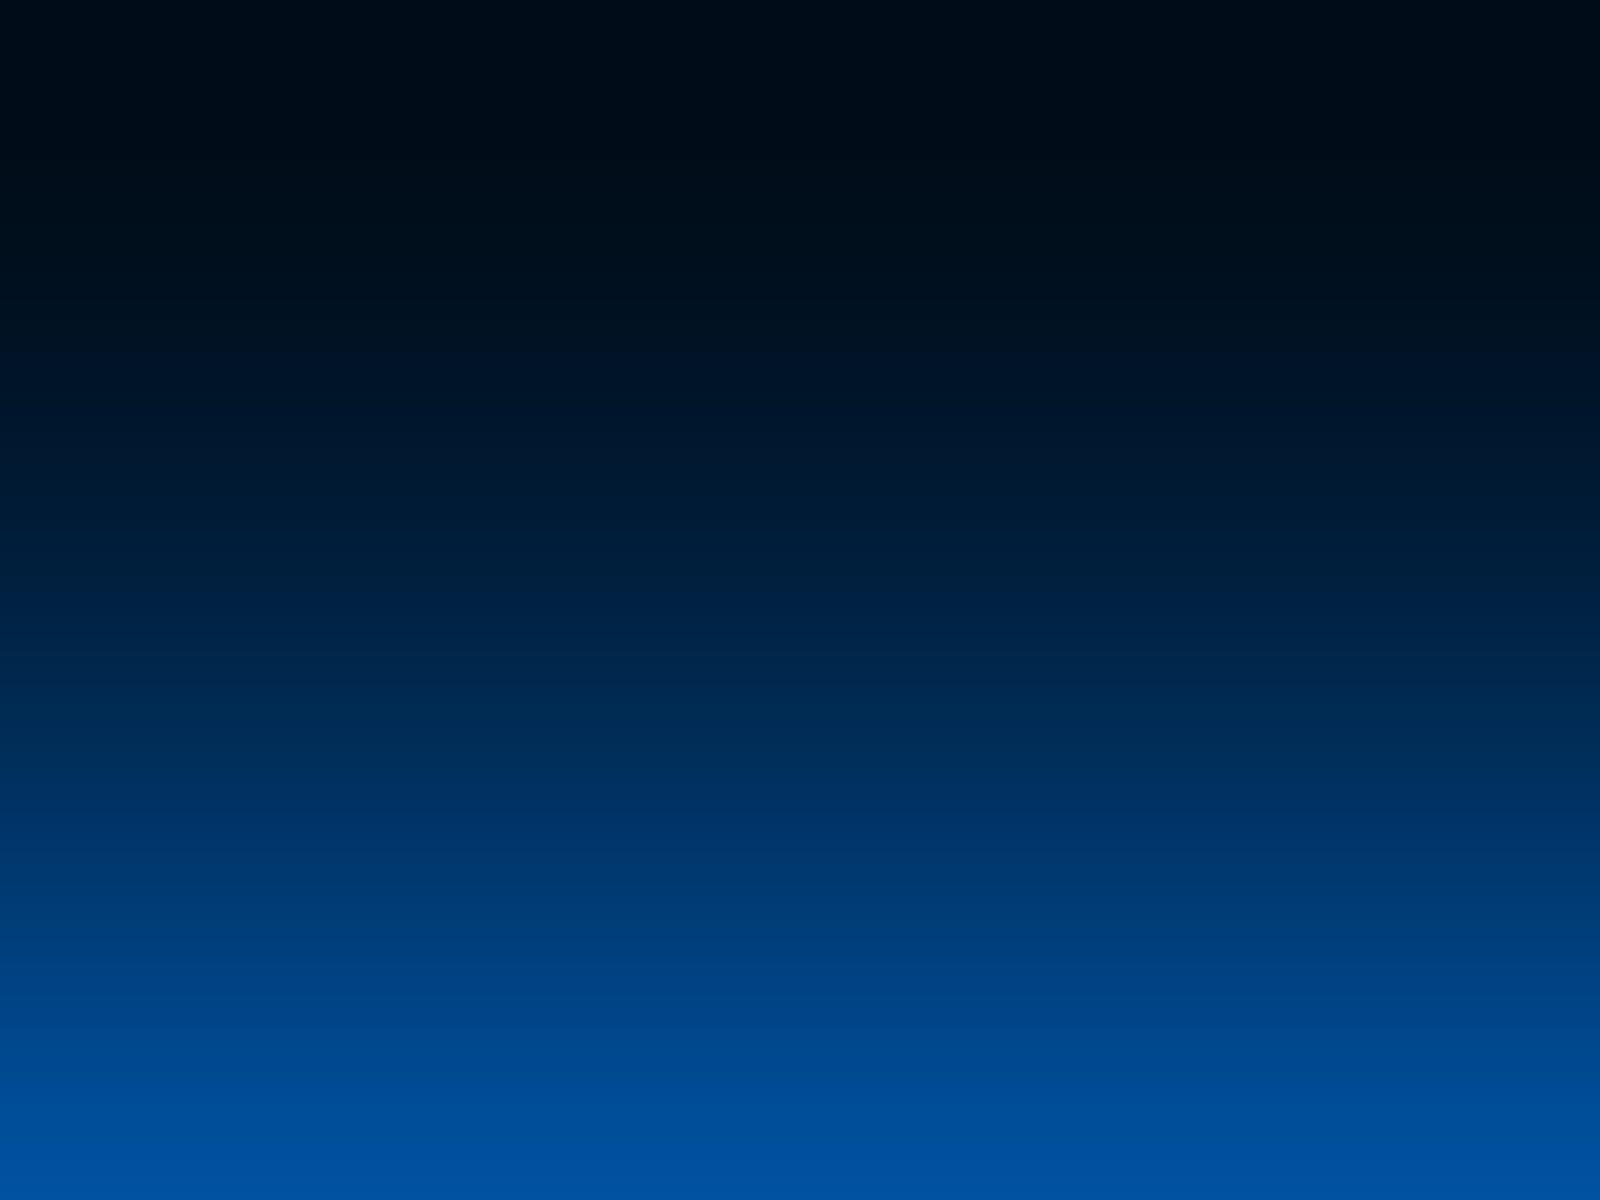 blue gradient 1600x1200